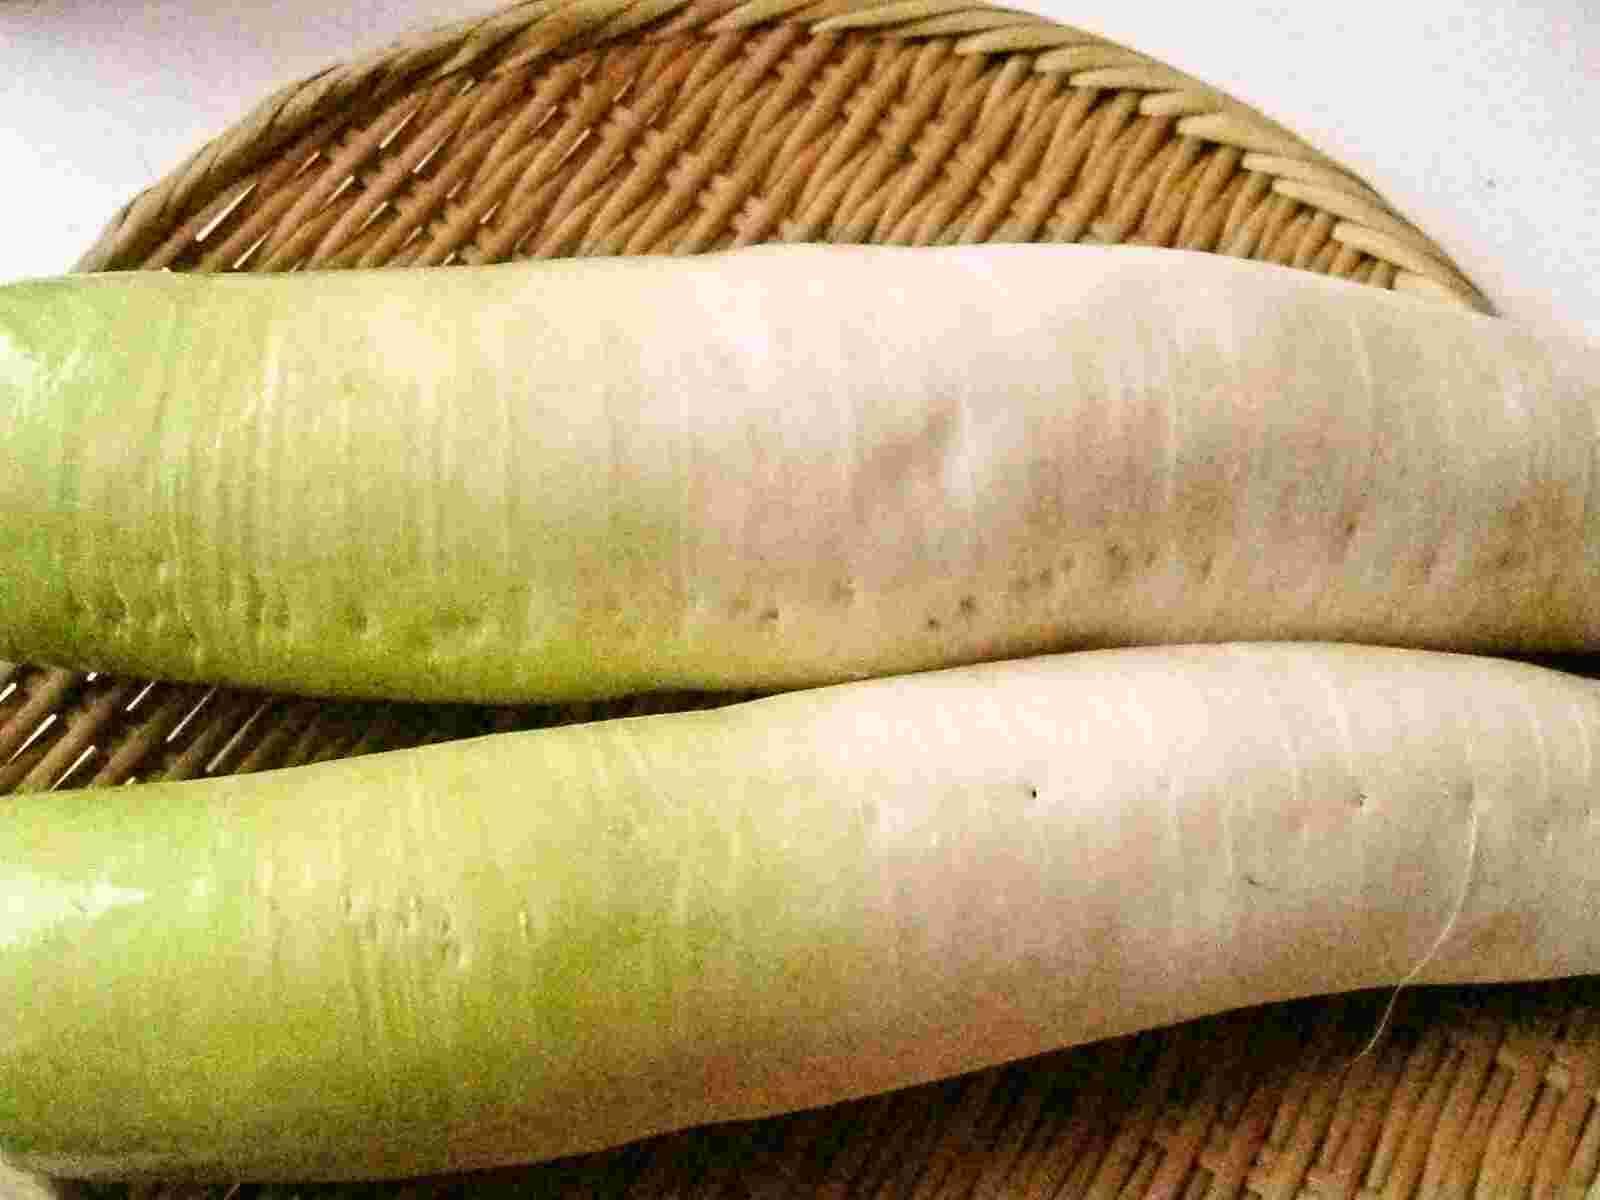 Recipes for Tom Daikon radish